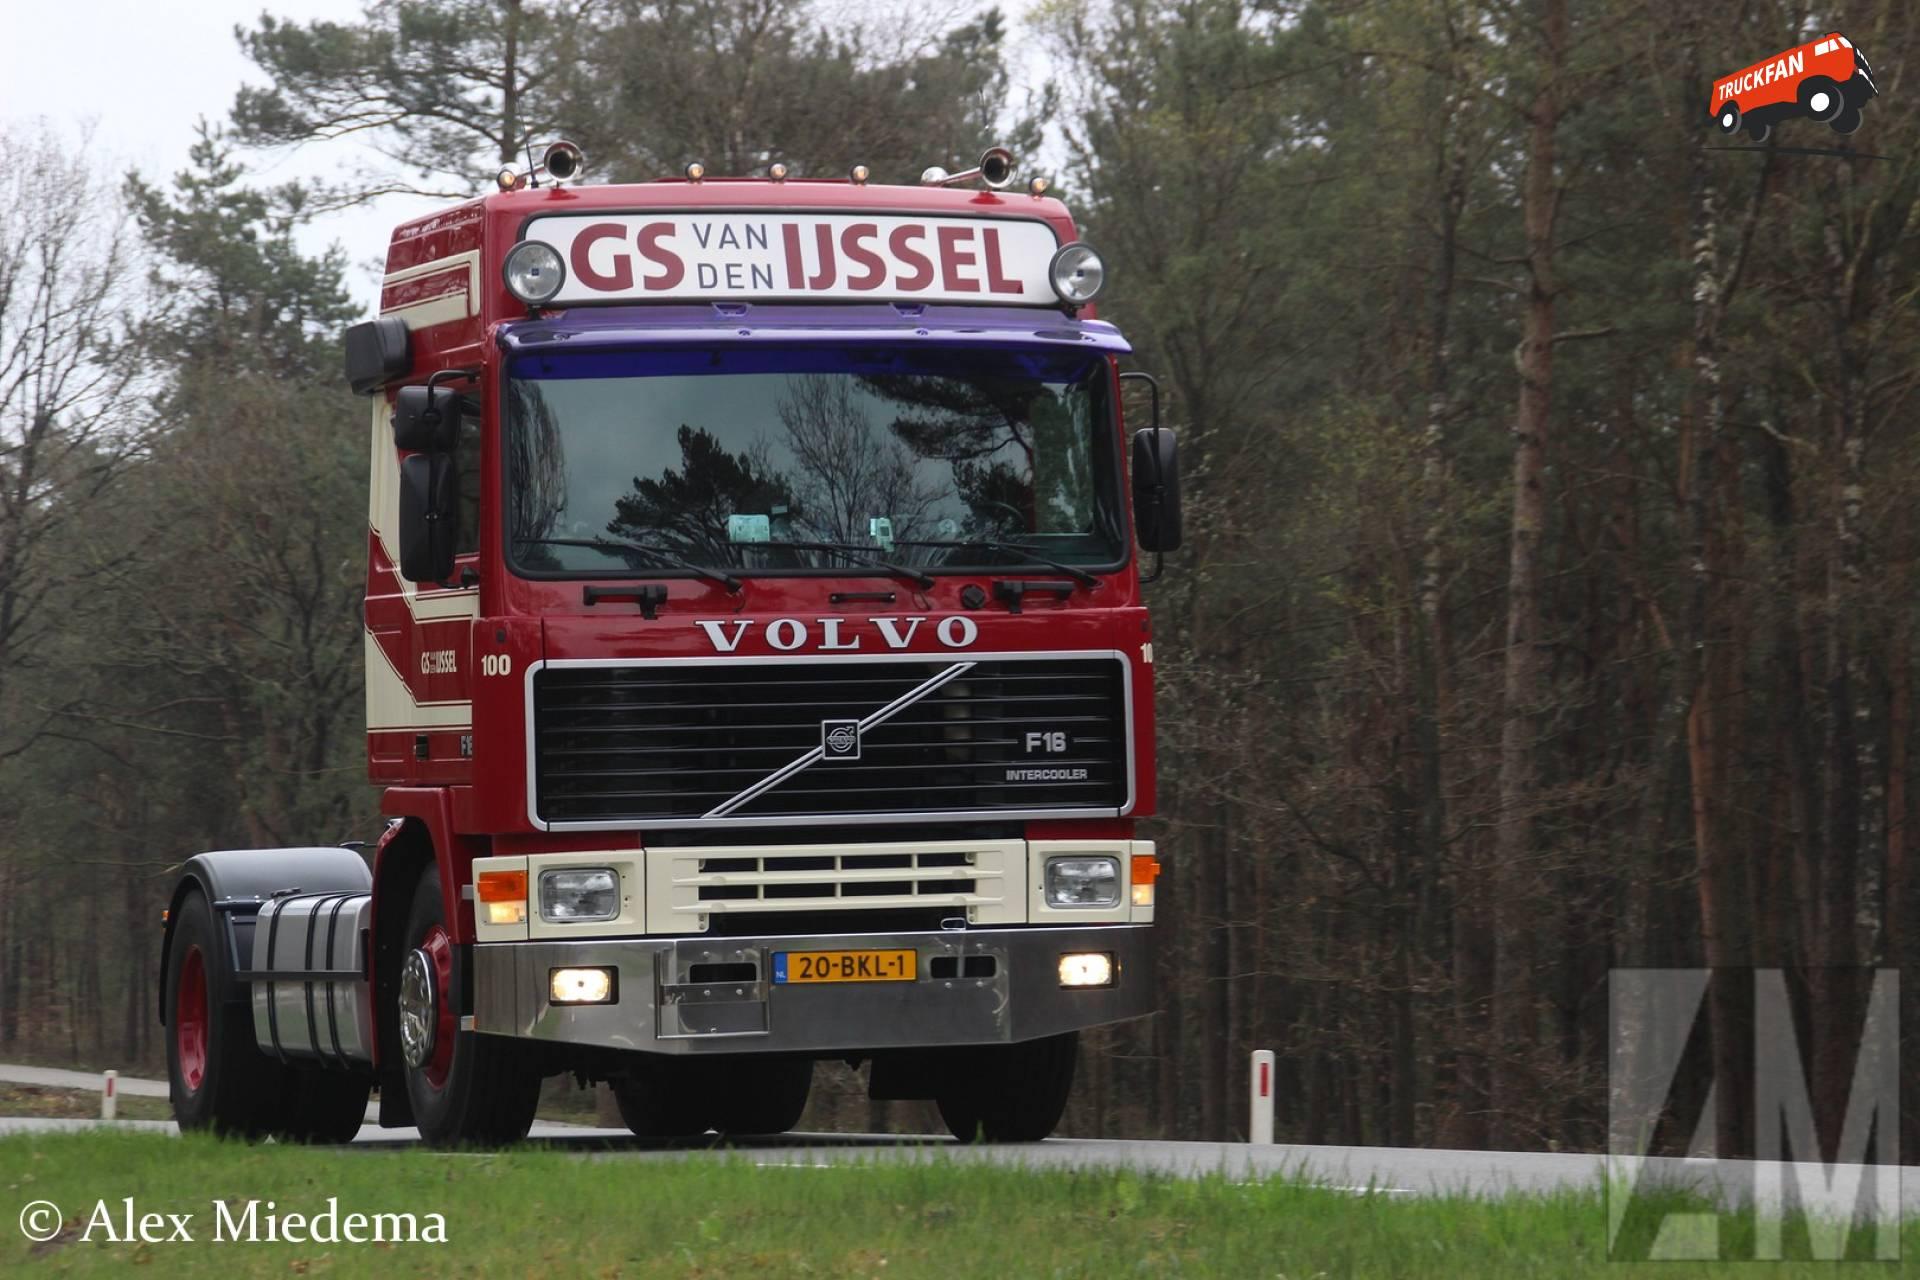 Volvo F16